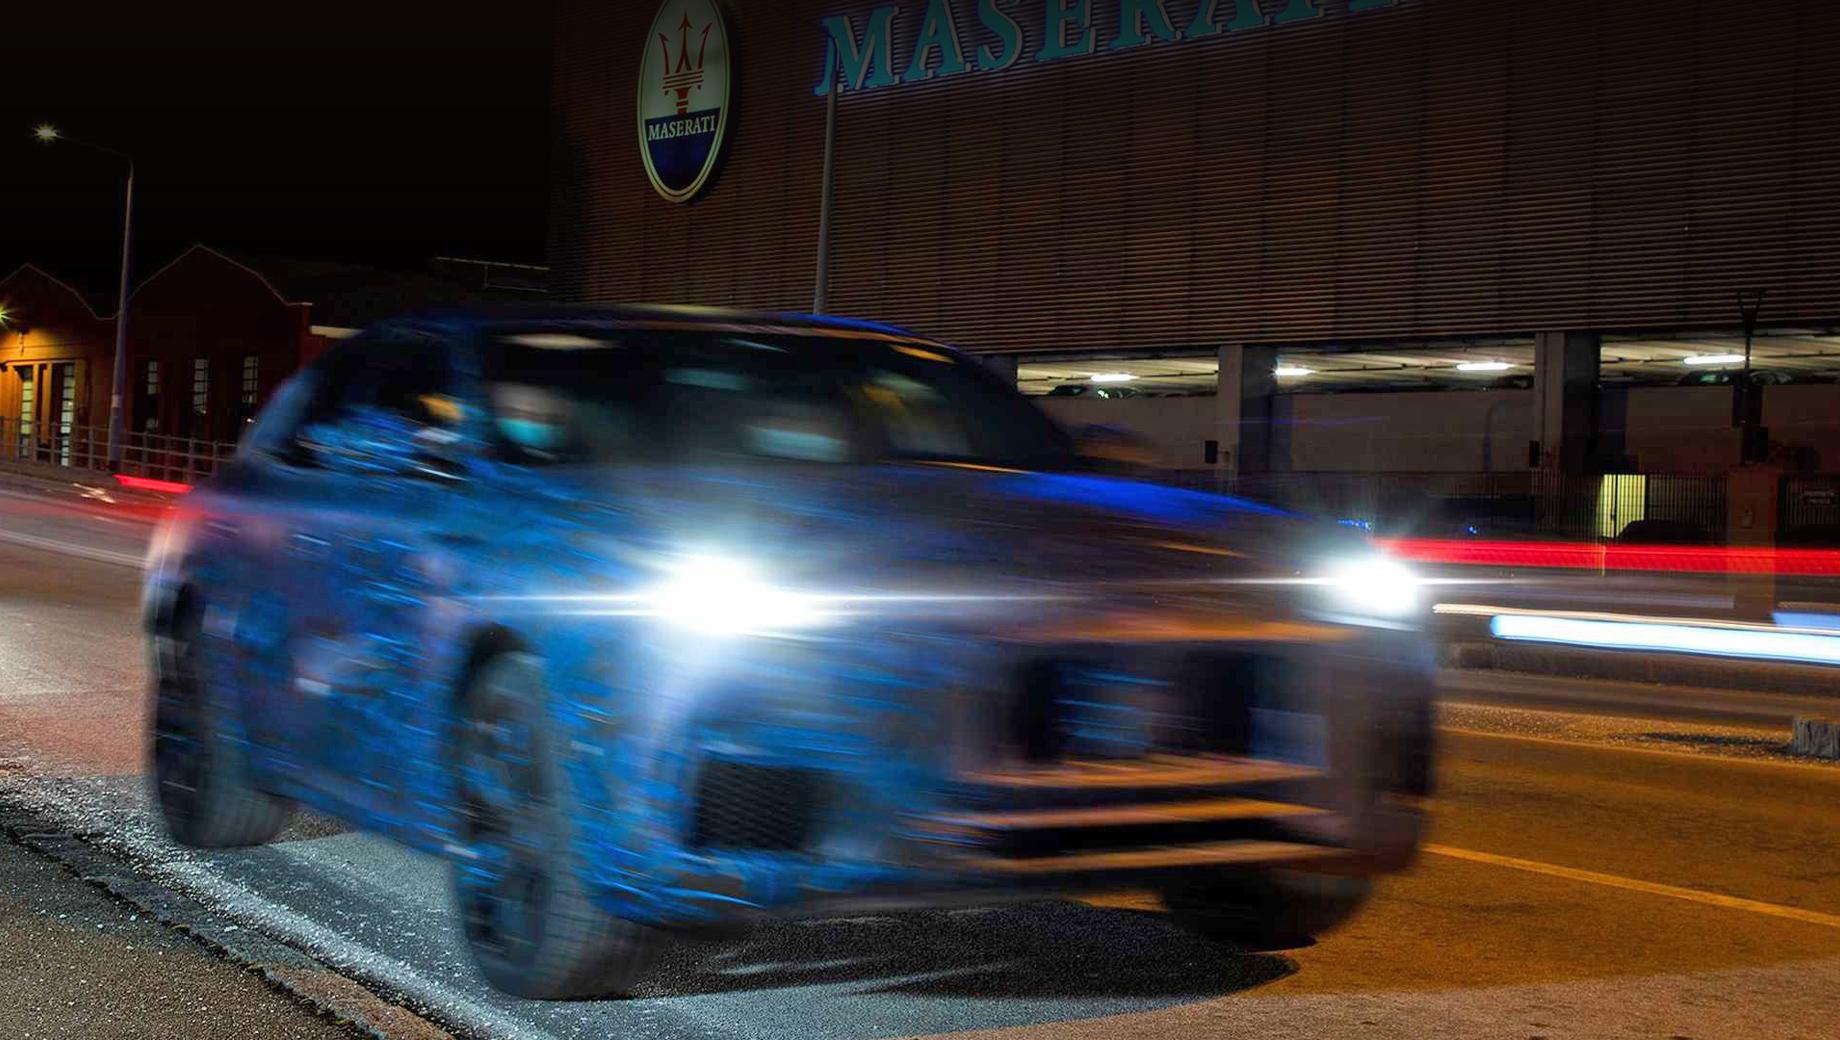 Кроссовер Maserati Grecale раскрыл больше деталей на тизерах